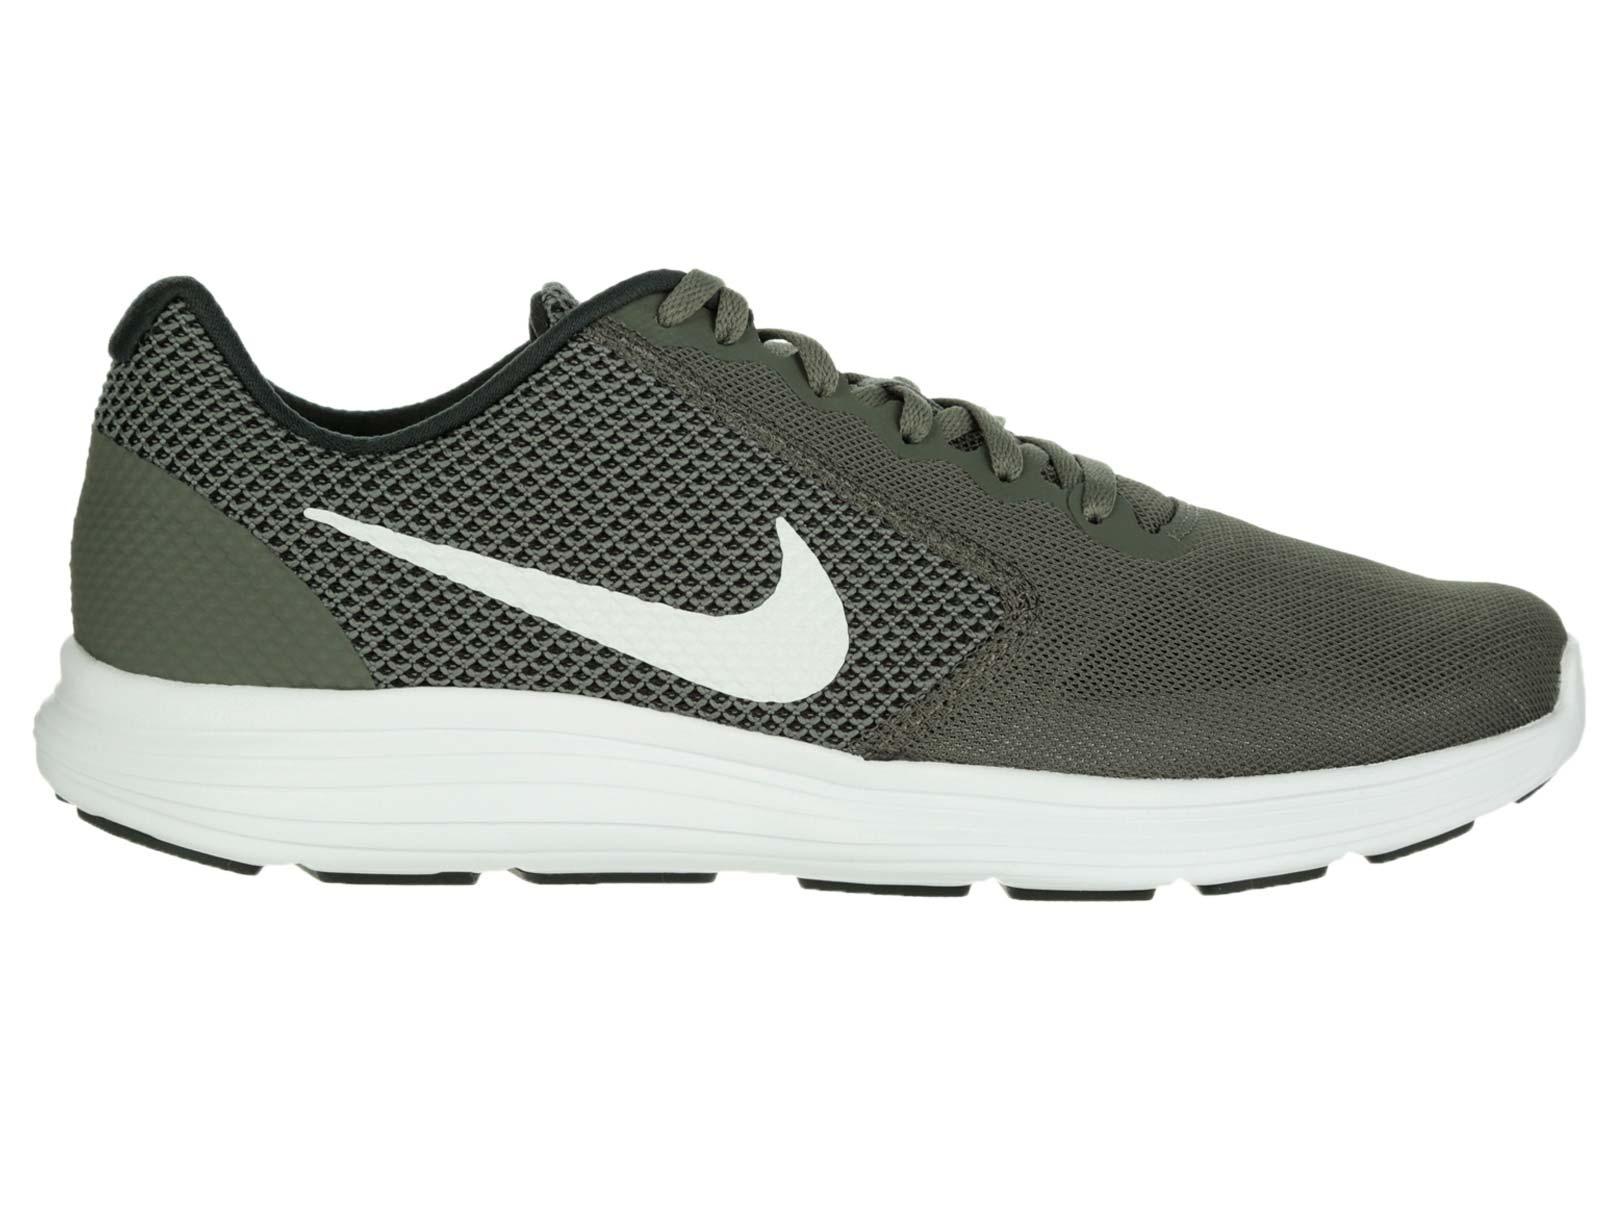 Liverpool: Tenis Nike Revolution 3 para caballero